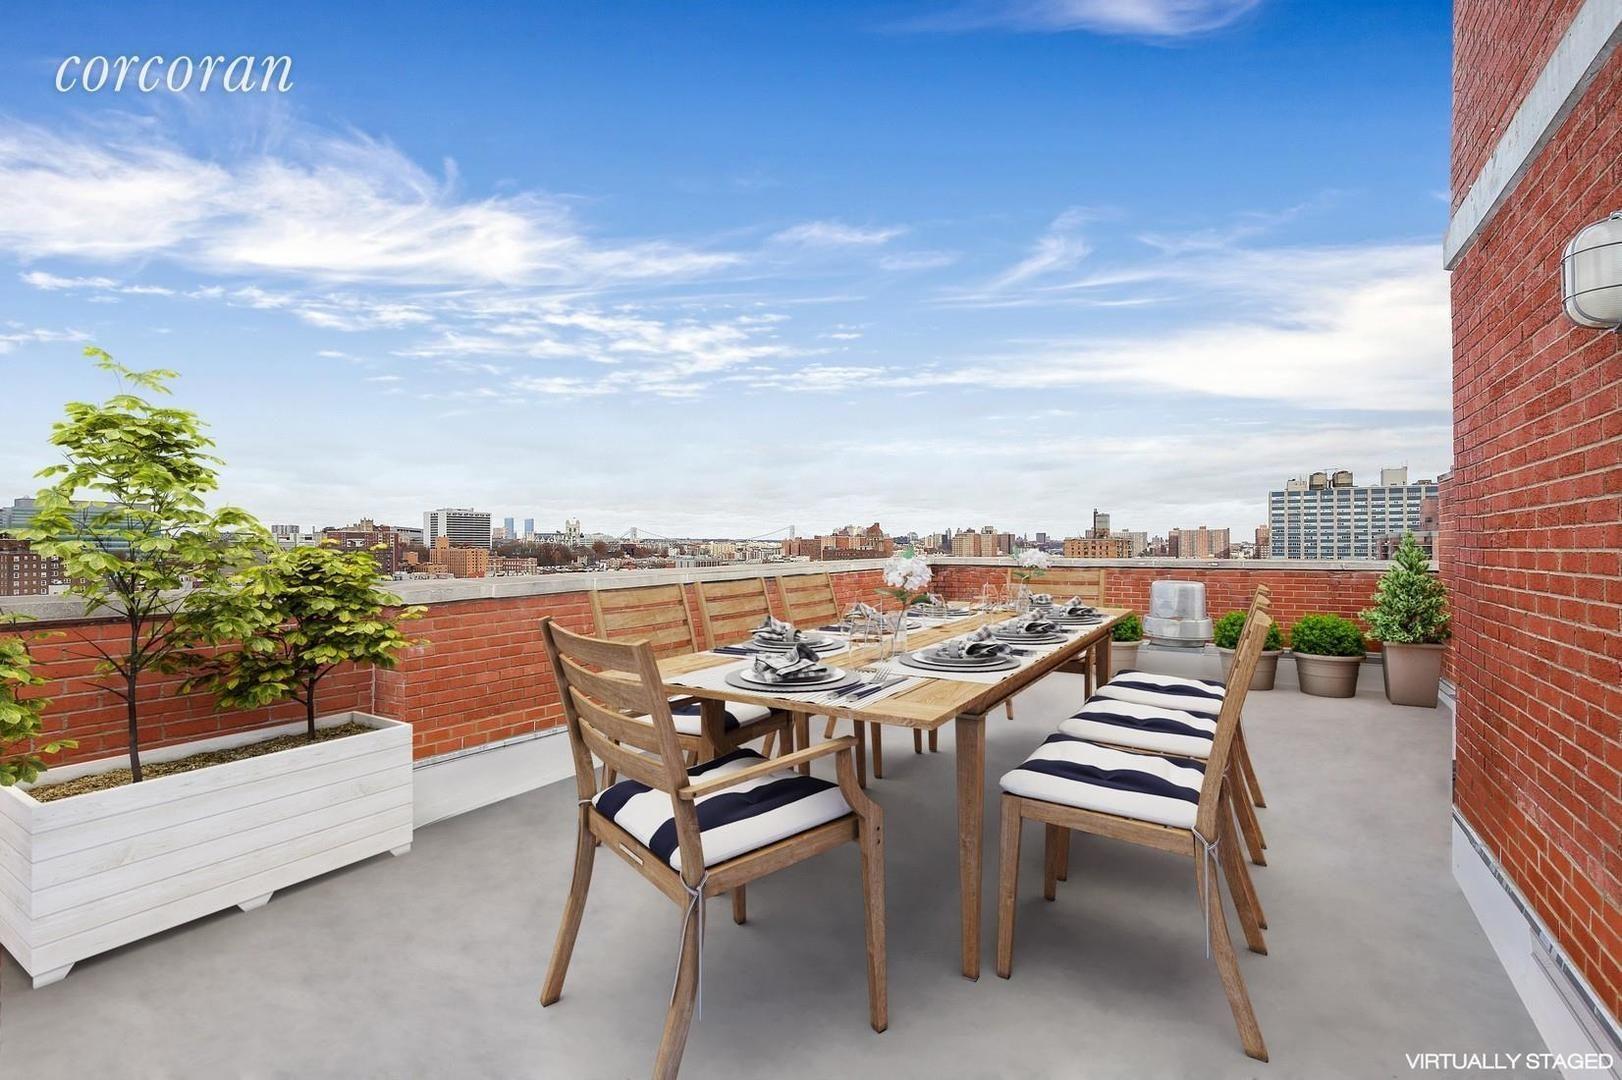 Apartment for sale at 380 Lenox Avenue, Apt PHG